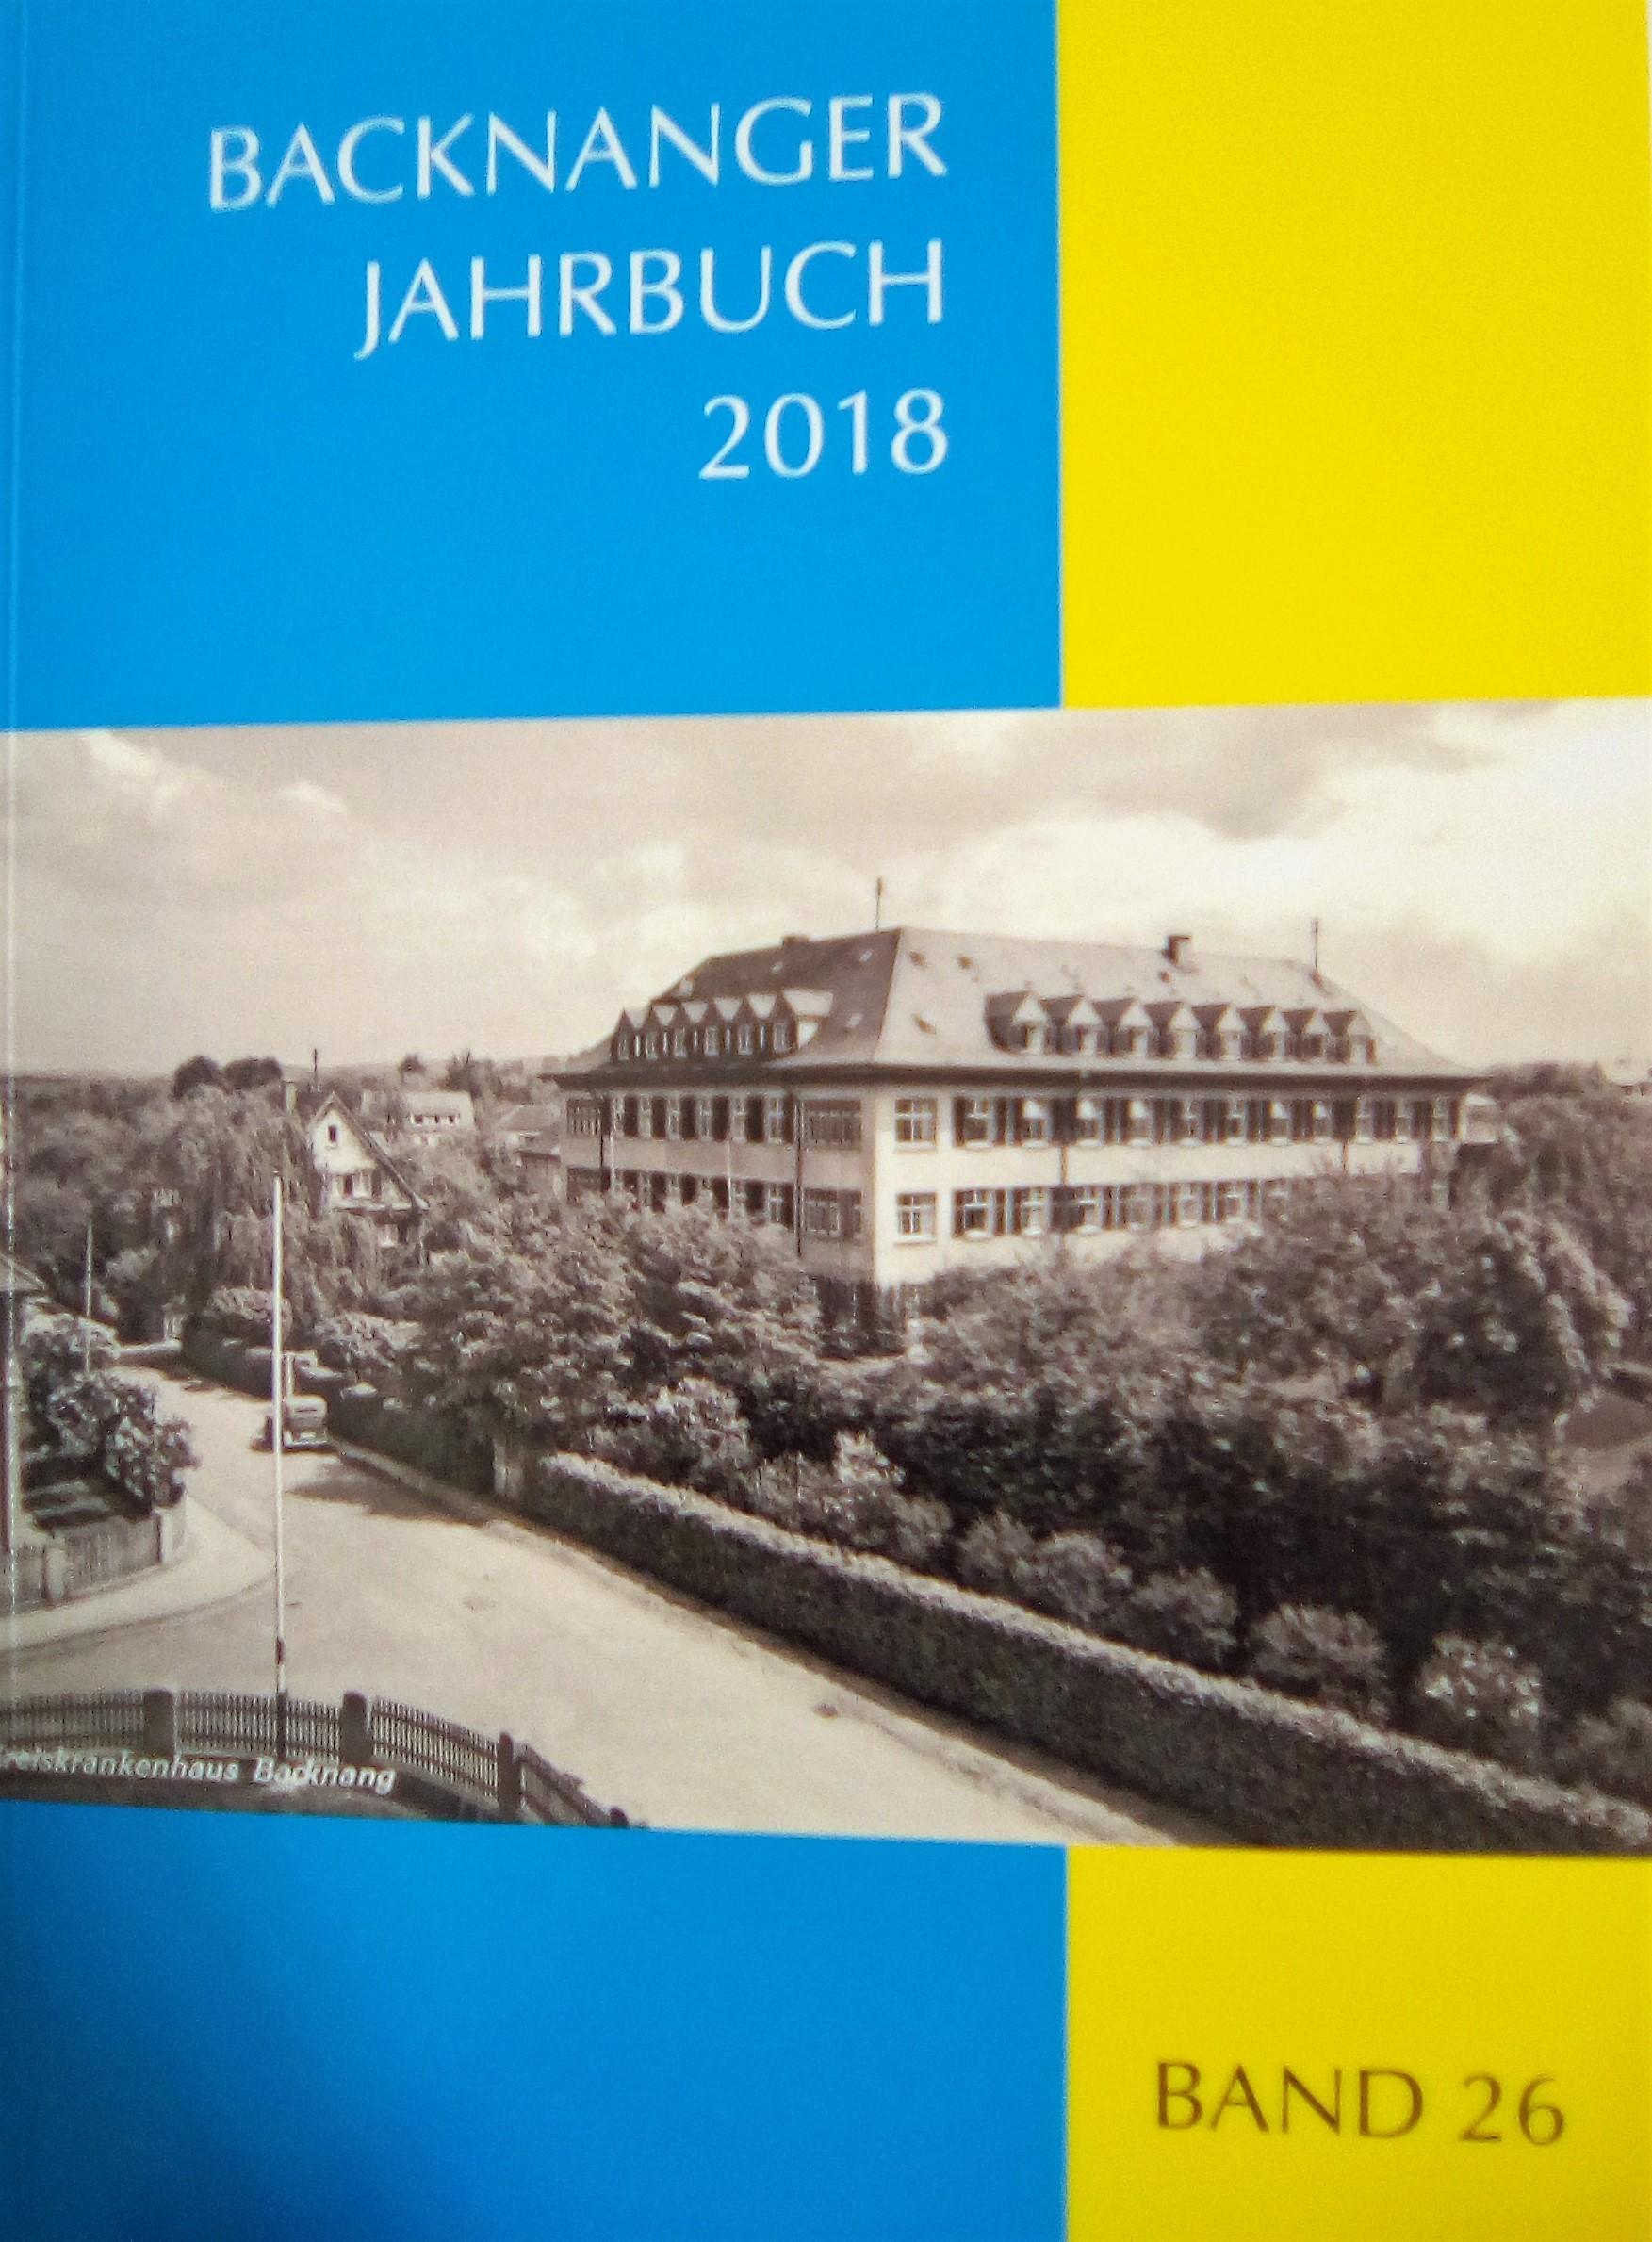 Backnanger Jahrbuch Band 26 - 2018